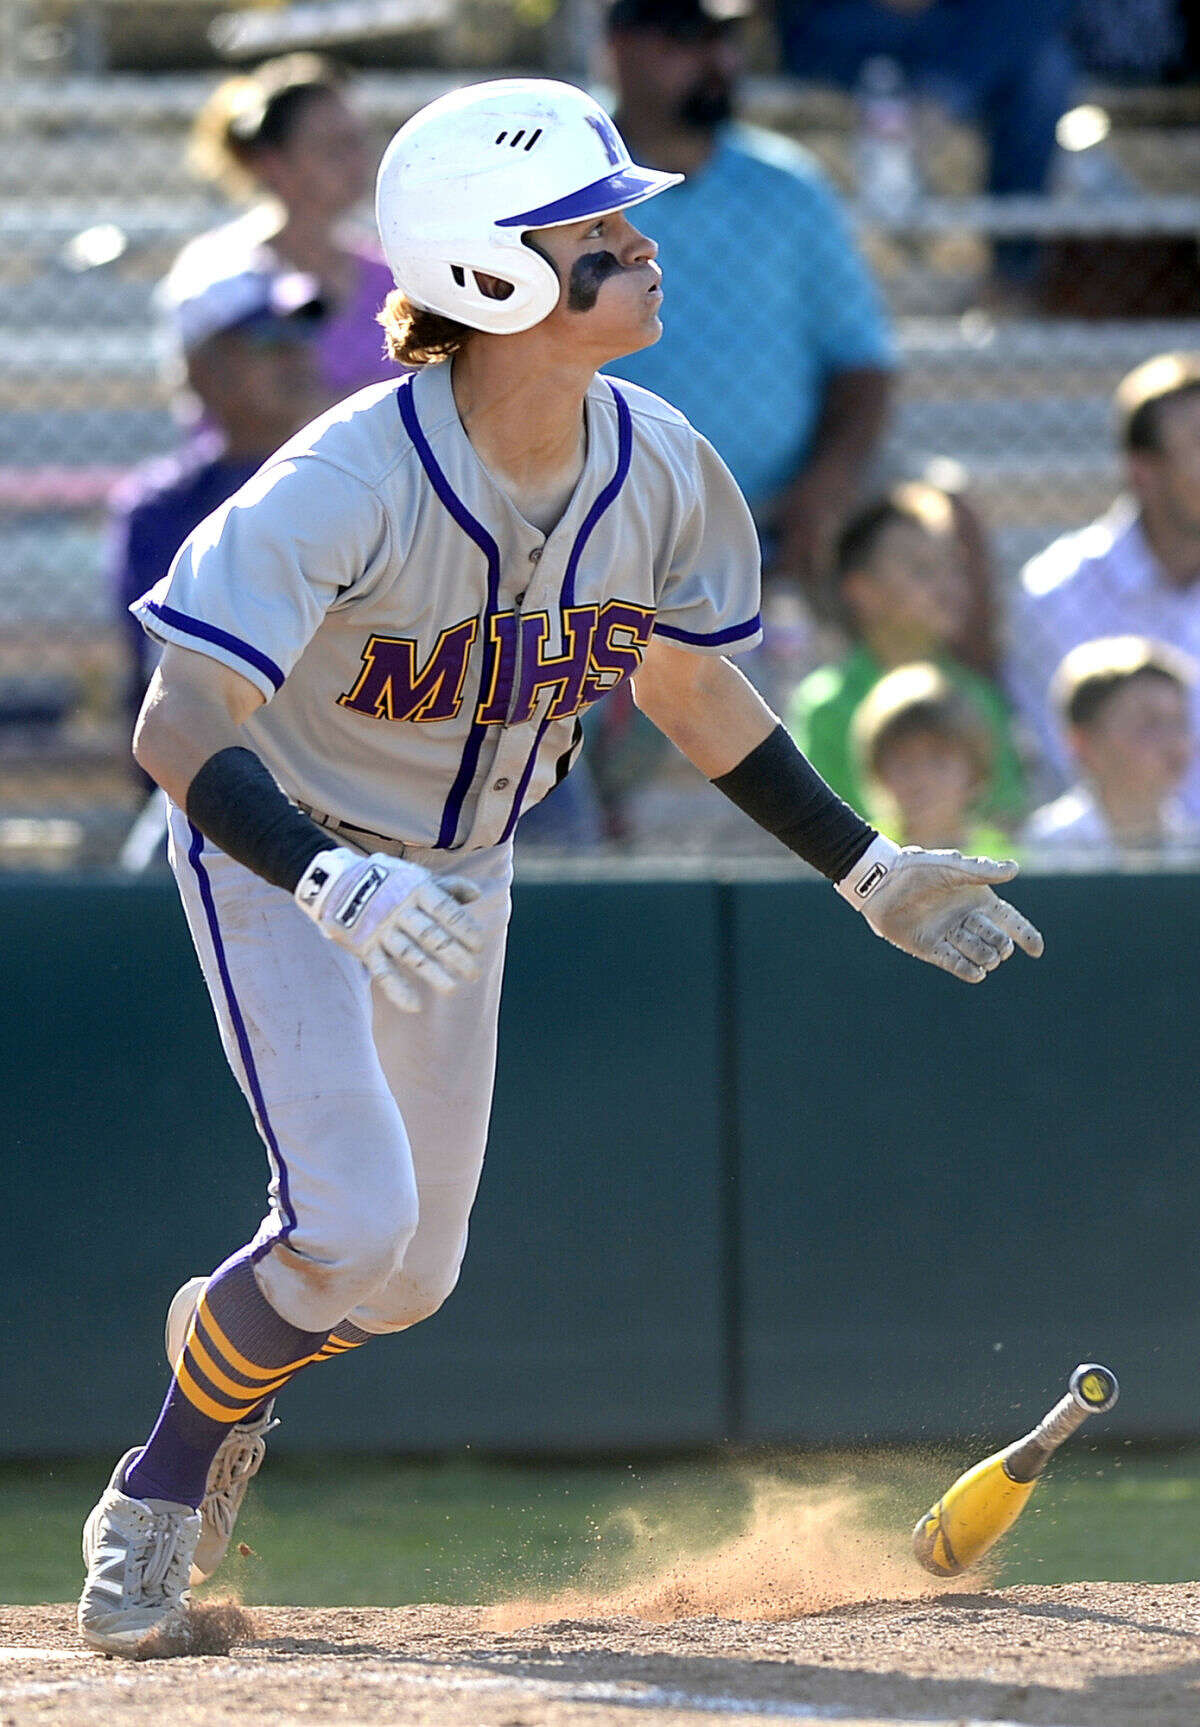 Midland High's Jaxon Hallmark (1) bats against Abilene on Wednesday, April 13, 2016, at Zachery Field. James Durbin/Reporter-Telegram